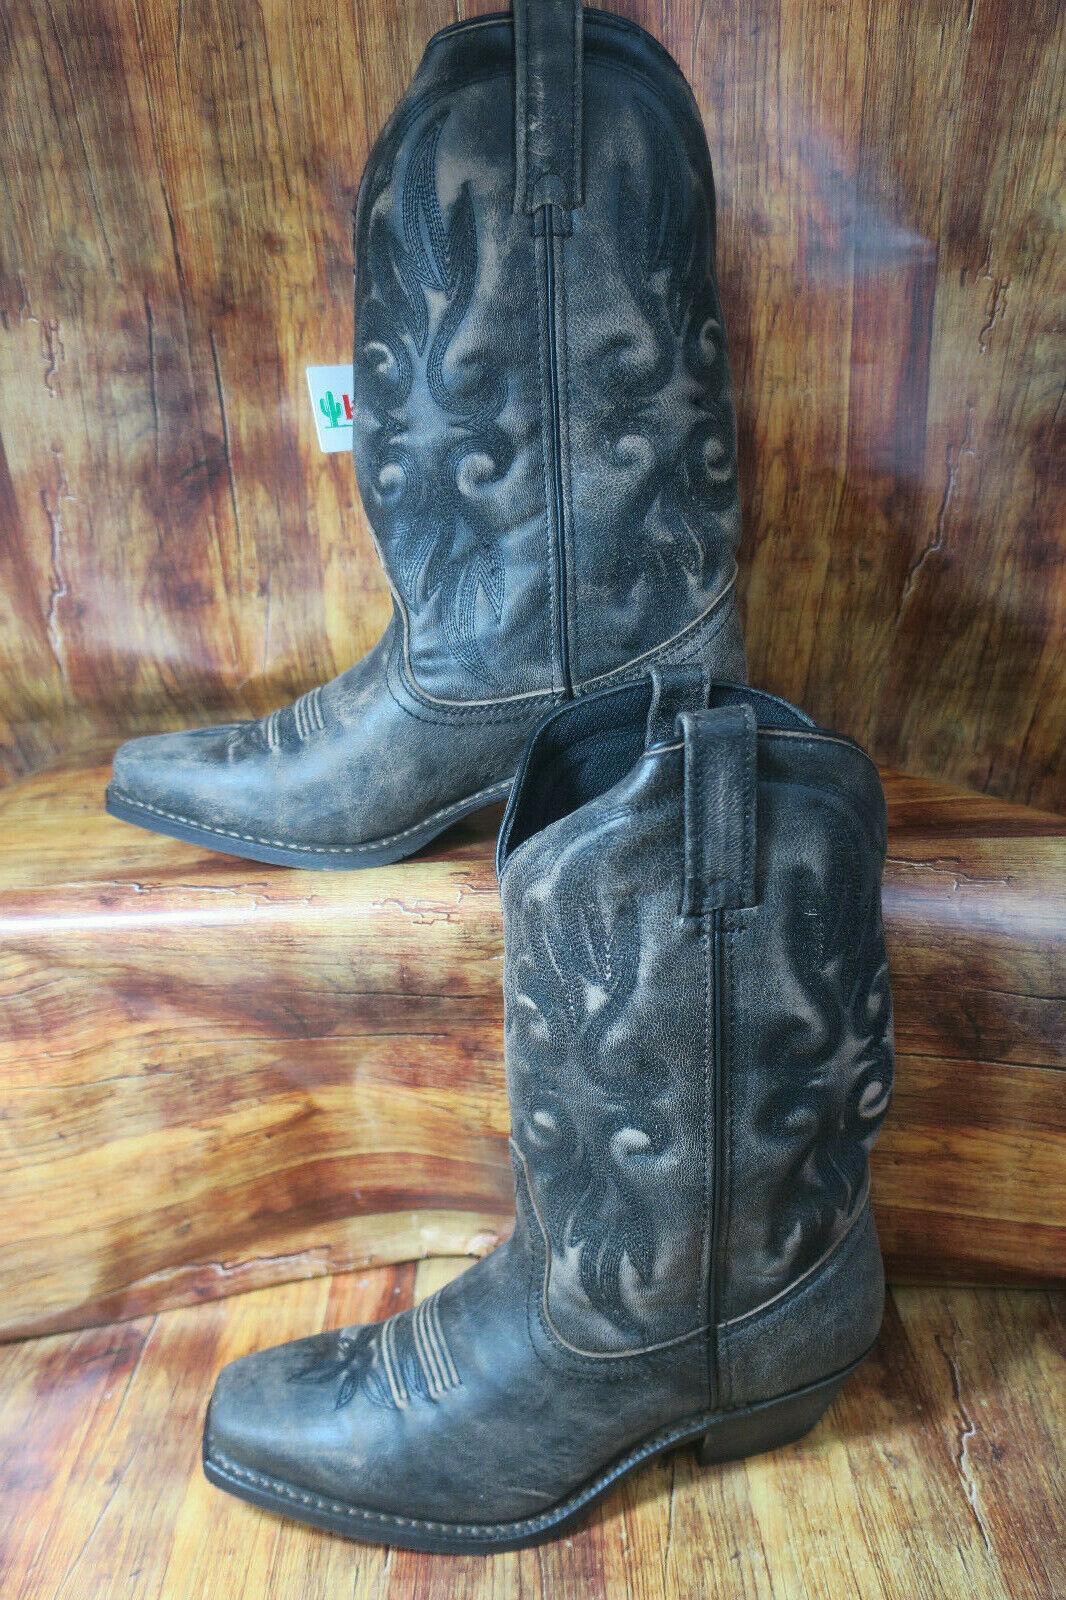 Laredo Laredo Laredo Maricopa Womens Size 9.5 Black Tan Western Cowboy Cowgirl Boots 1306 58bdc6